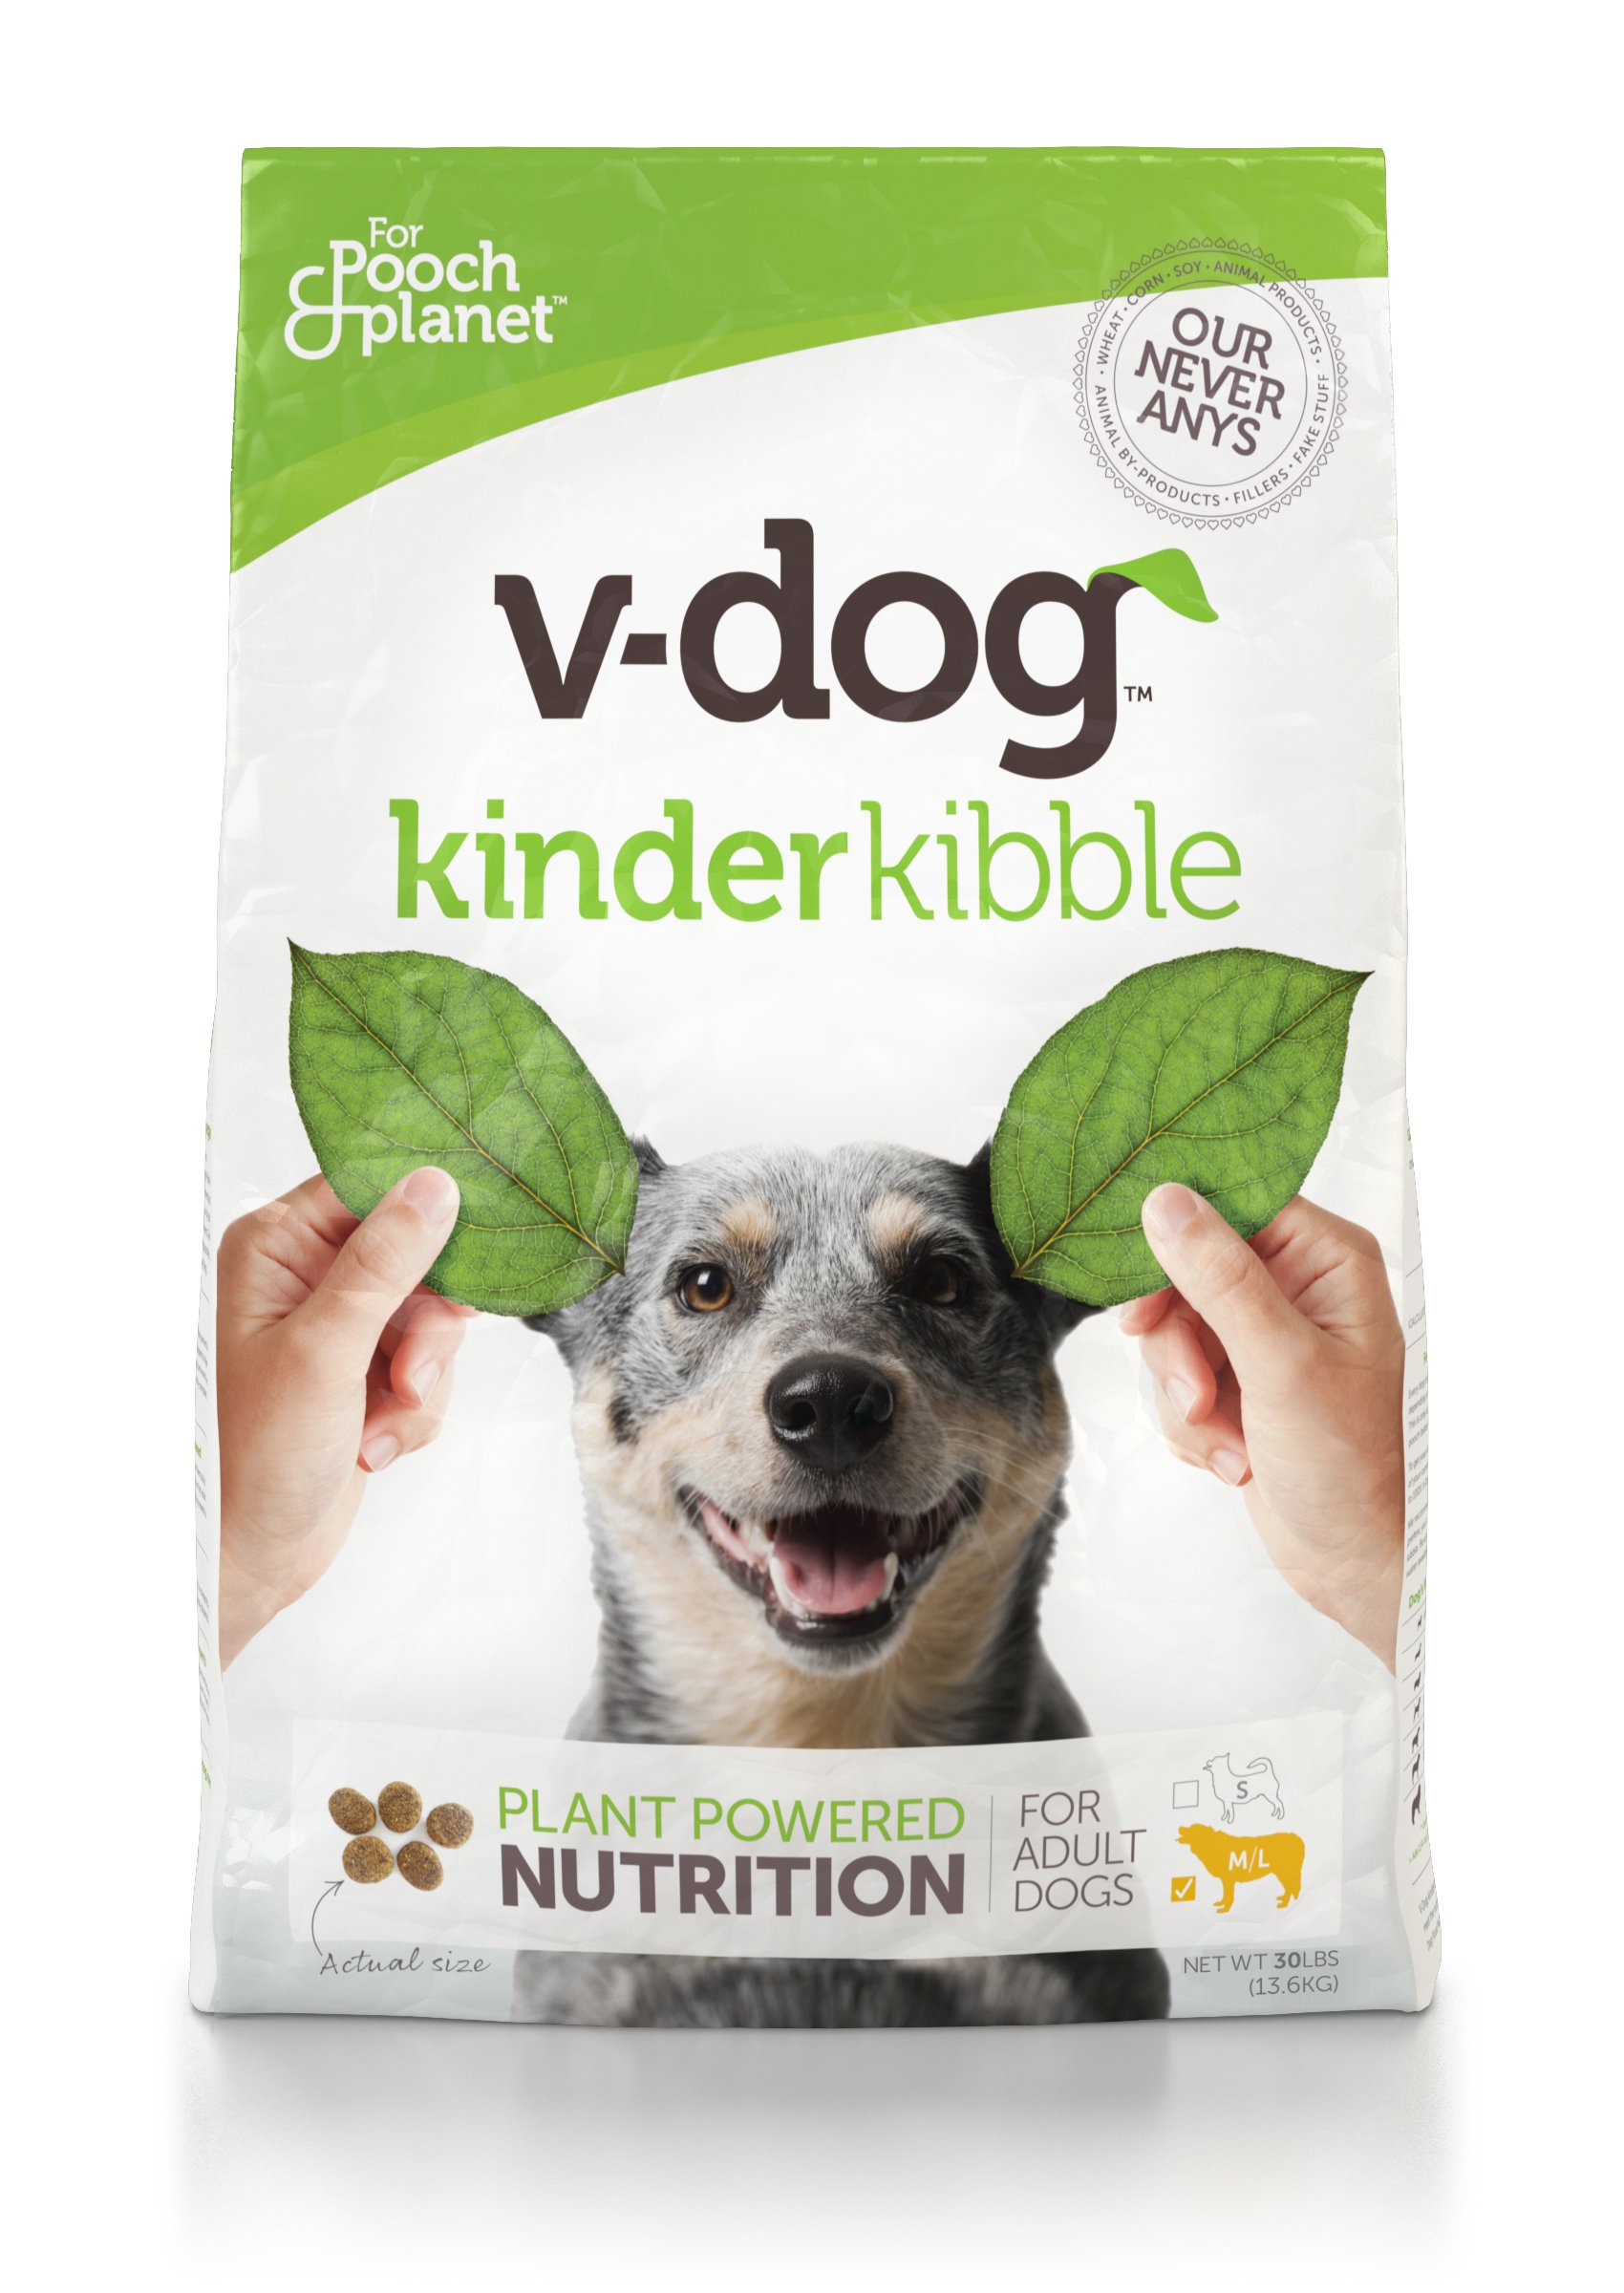 V-Dog Vegan Kibble Dry Dog Food, 30 Lb